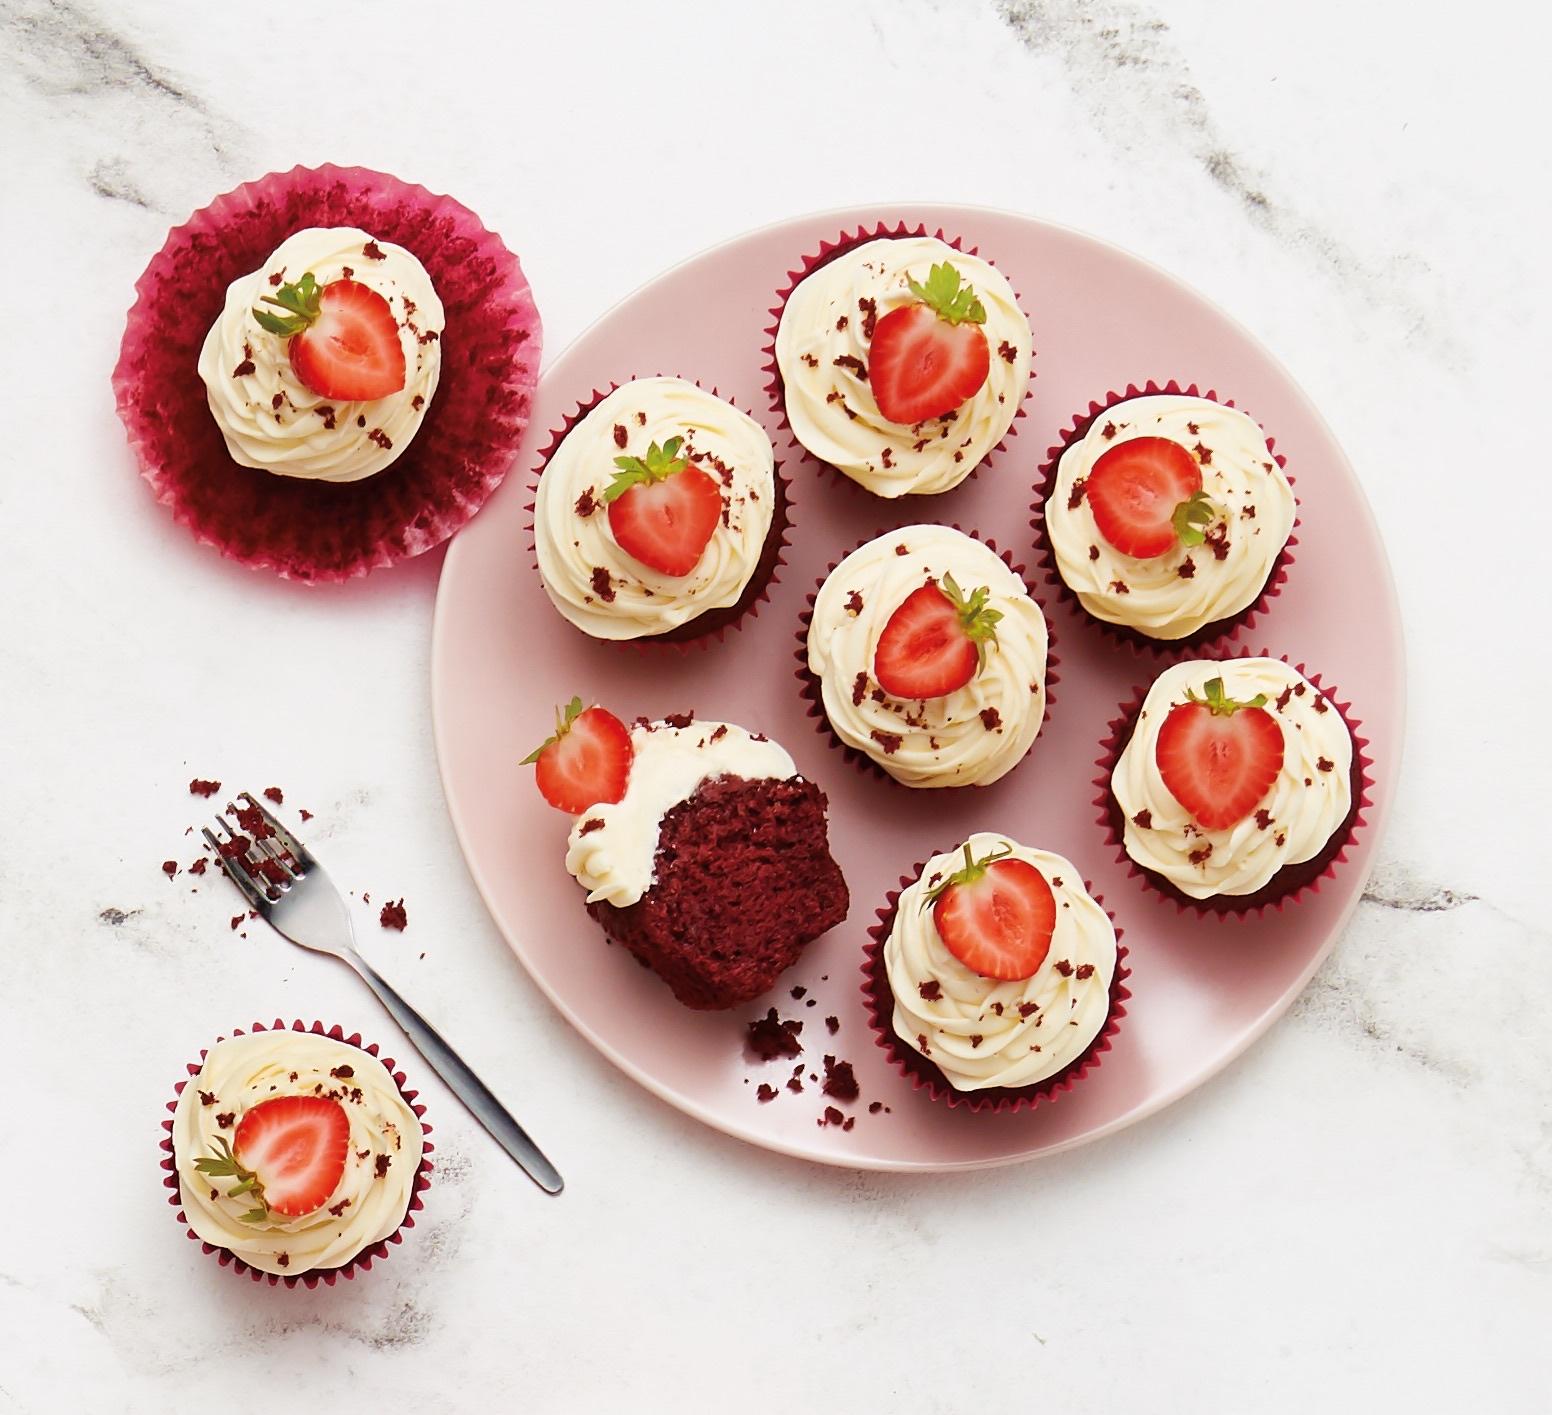 Aldi's Red Velvet Cupcakes